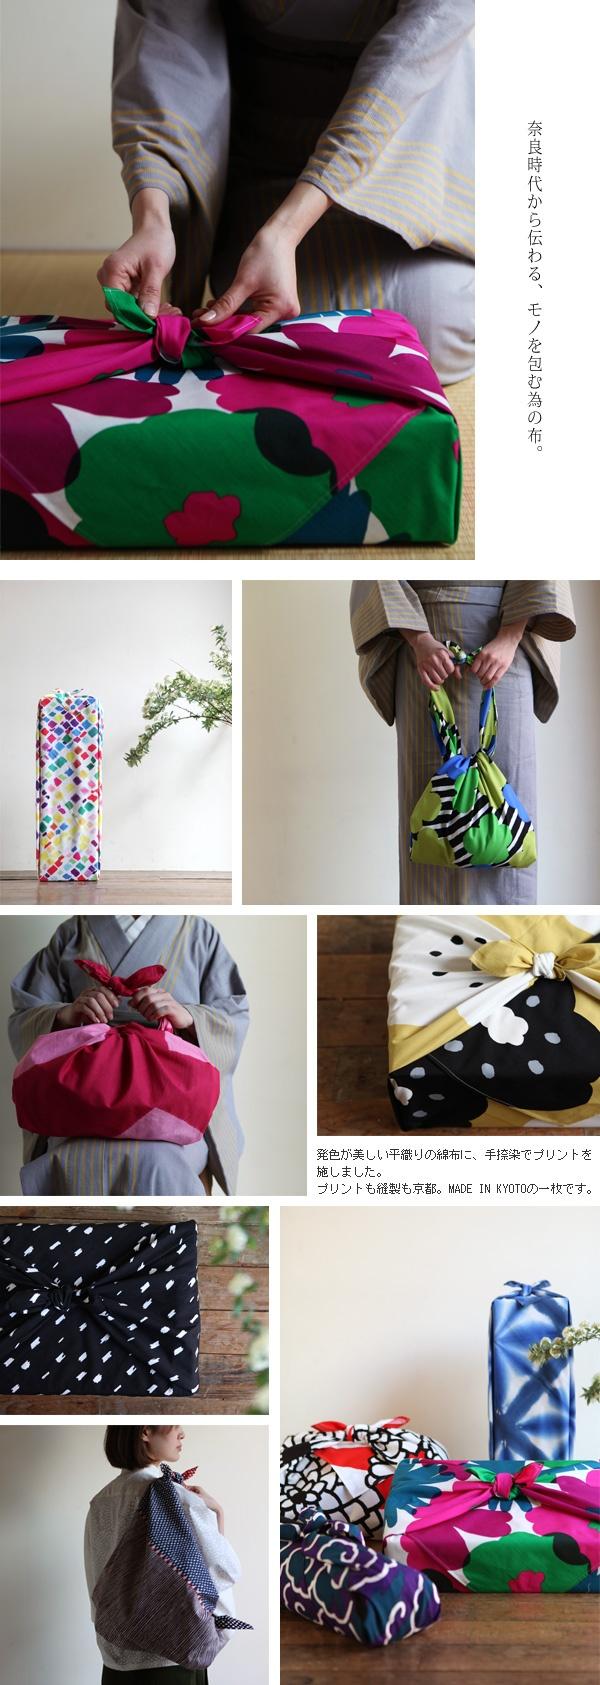 SouSou furoshiki. I love Sou Sou! I have tabi shoes, and Sam just bought me some Sou Sou thongs (flip flops).